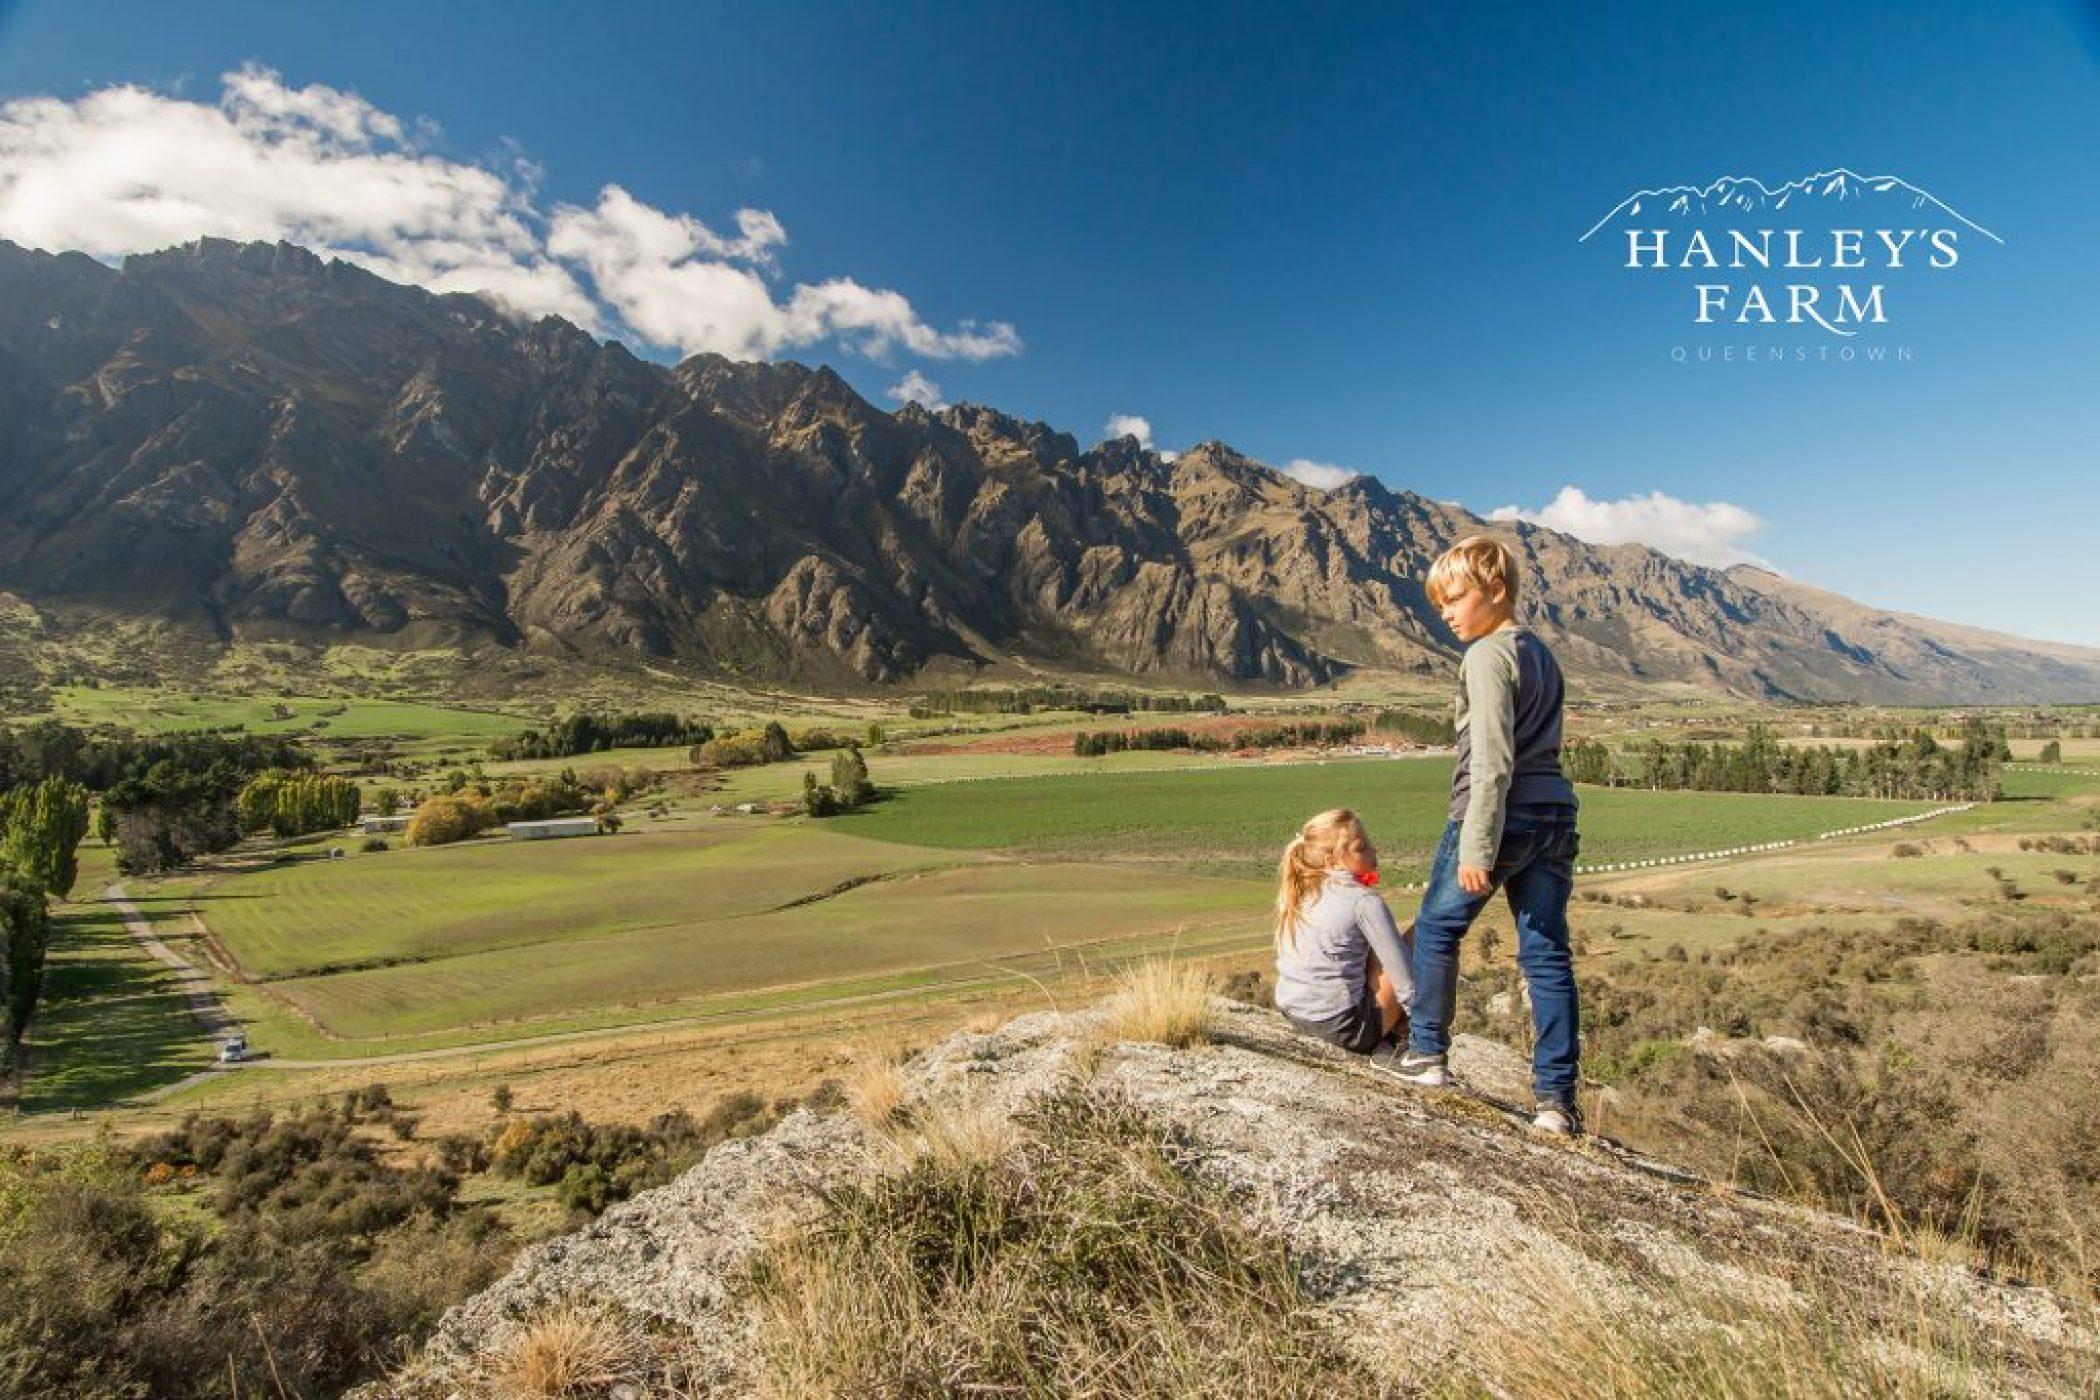 Hanleys Farm Photography